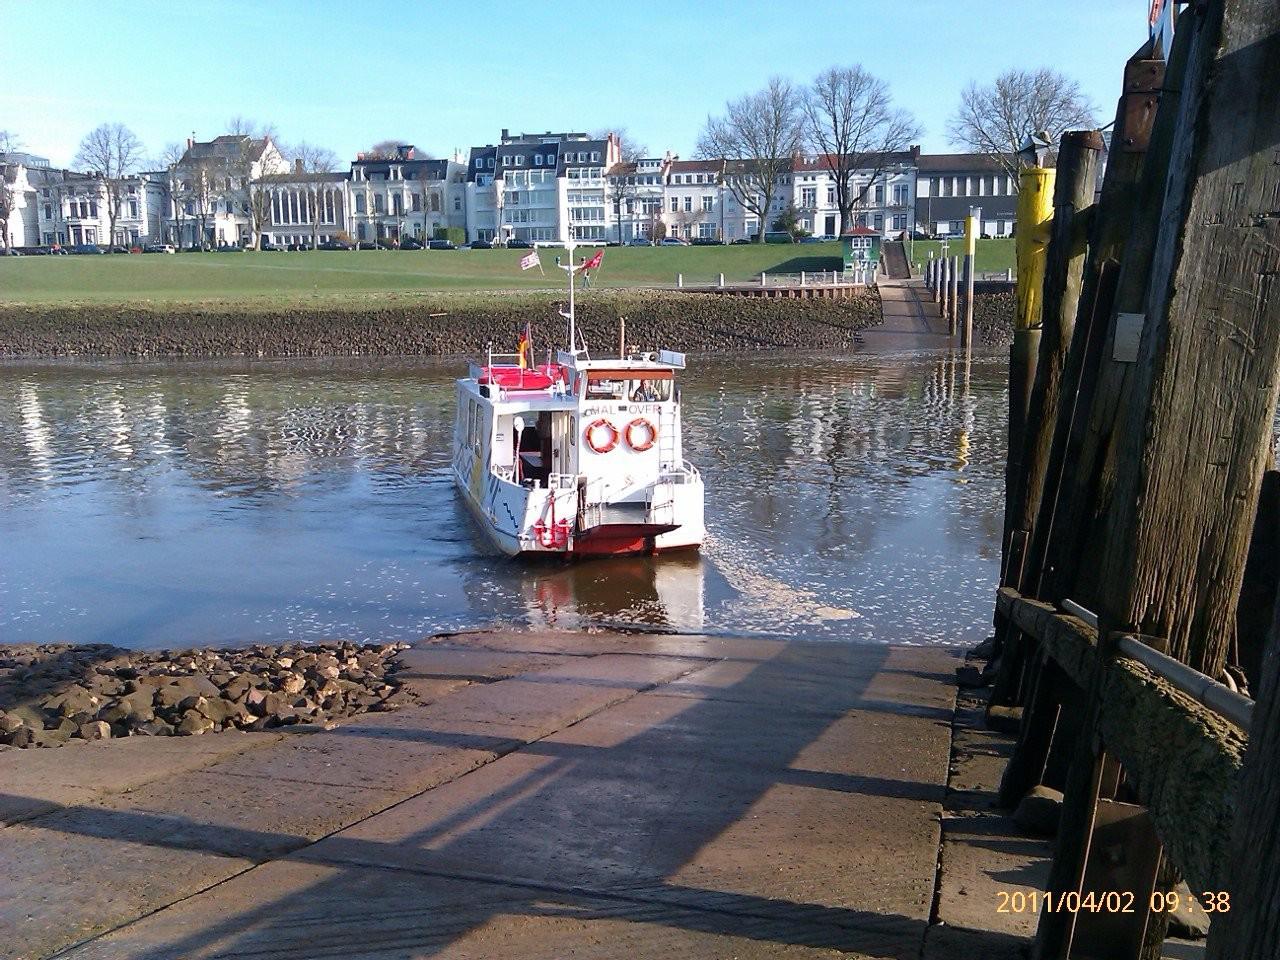 Fähre an der Weser